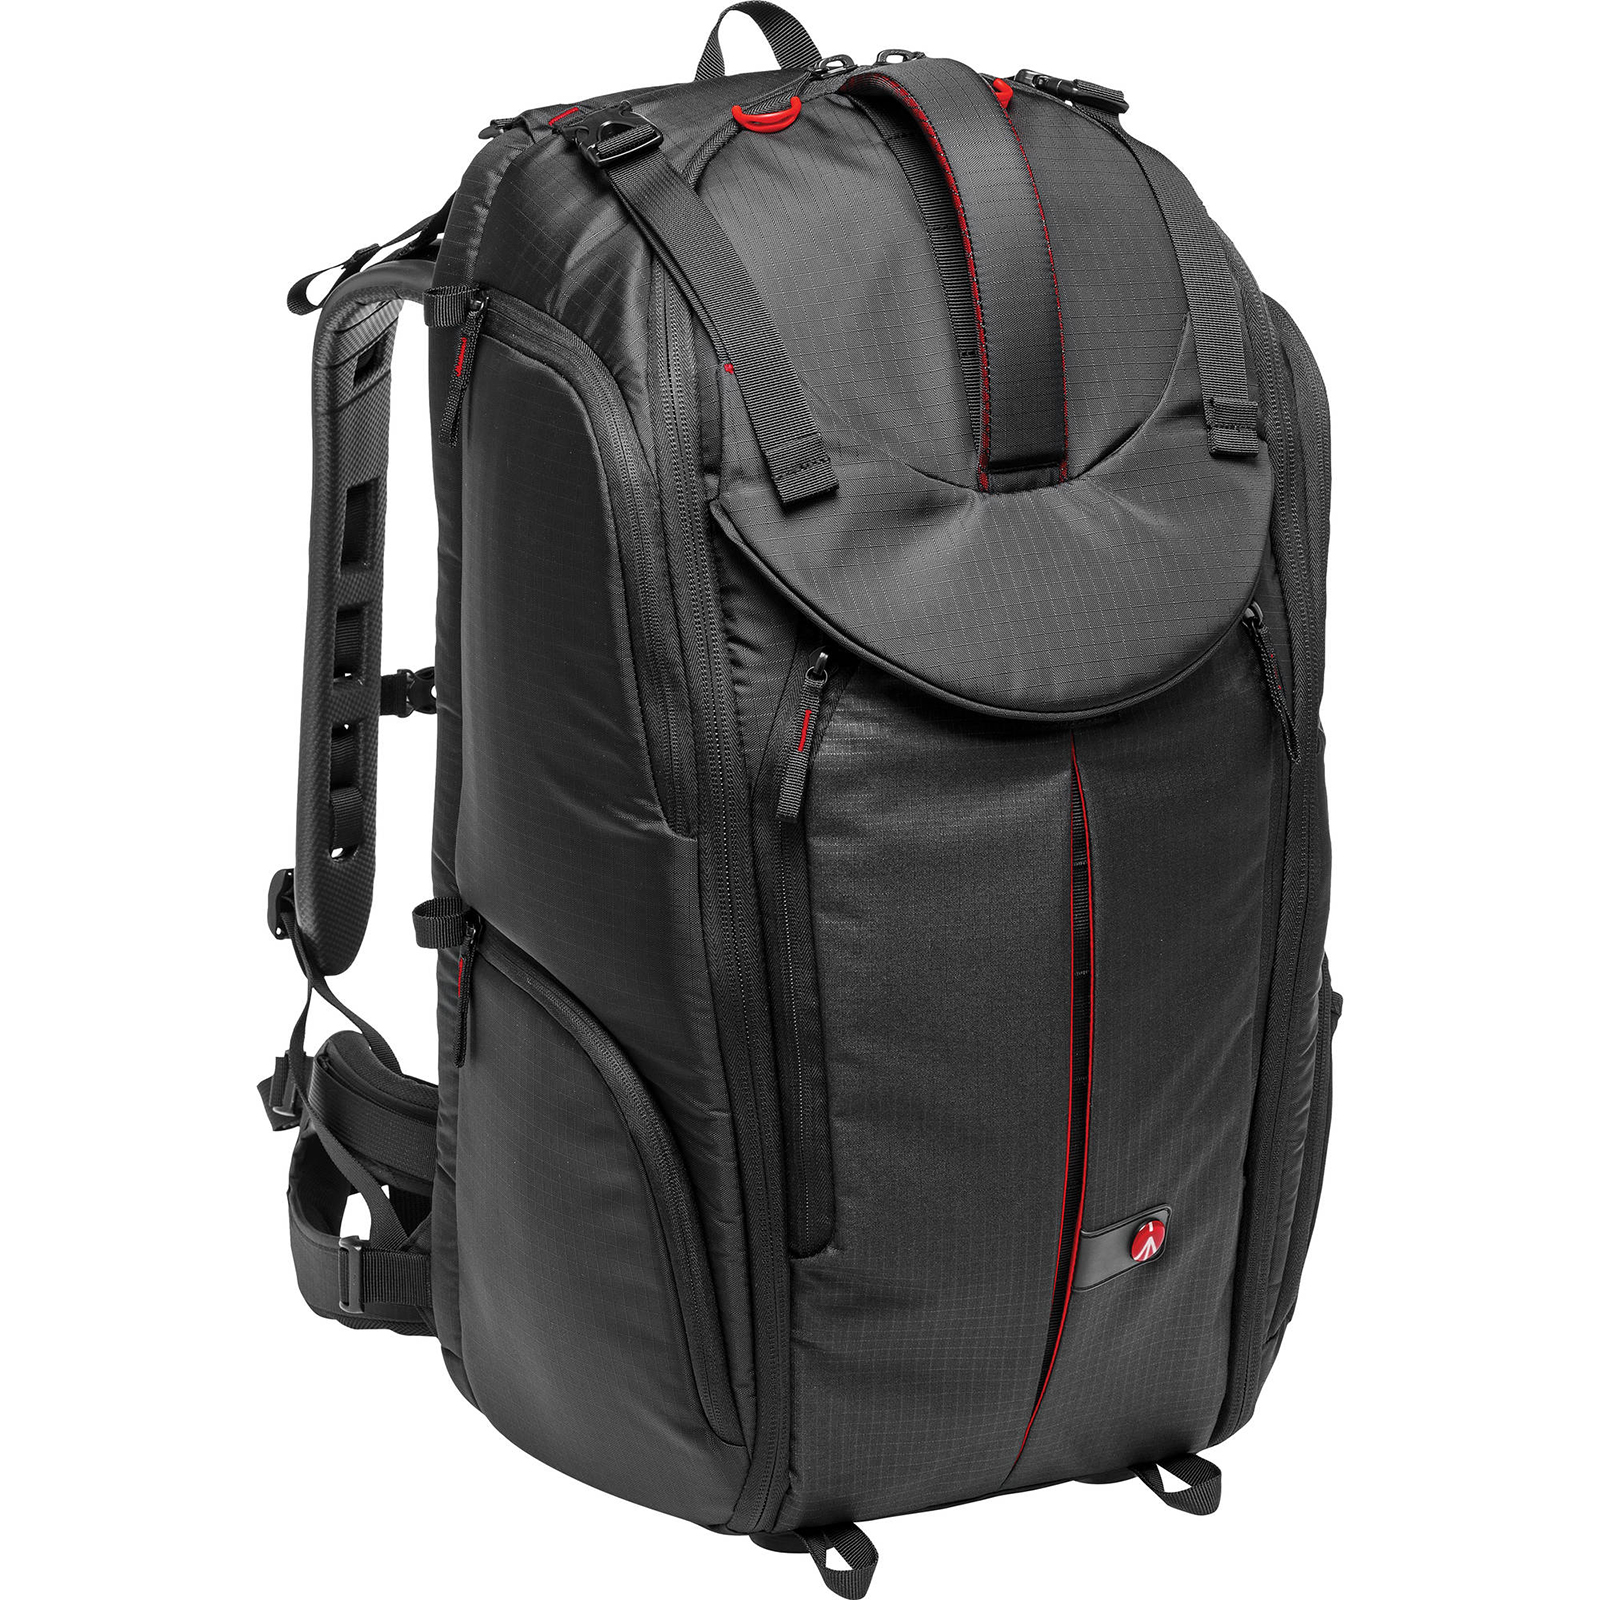 Manfrotto Pro Light Pro-V-610 PL DSLR Video Camera Backpack